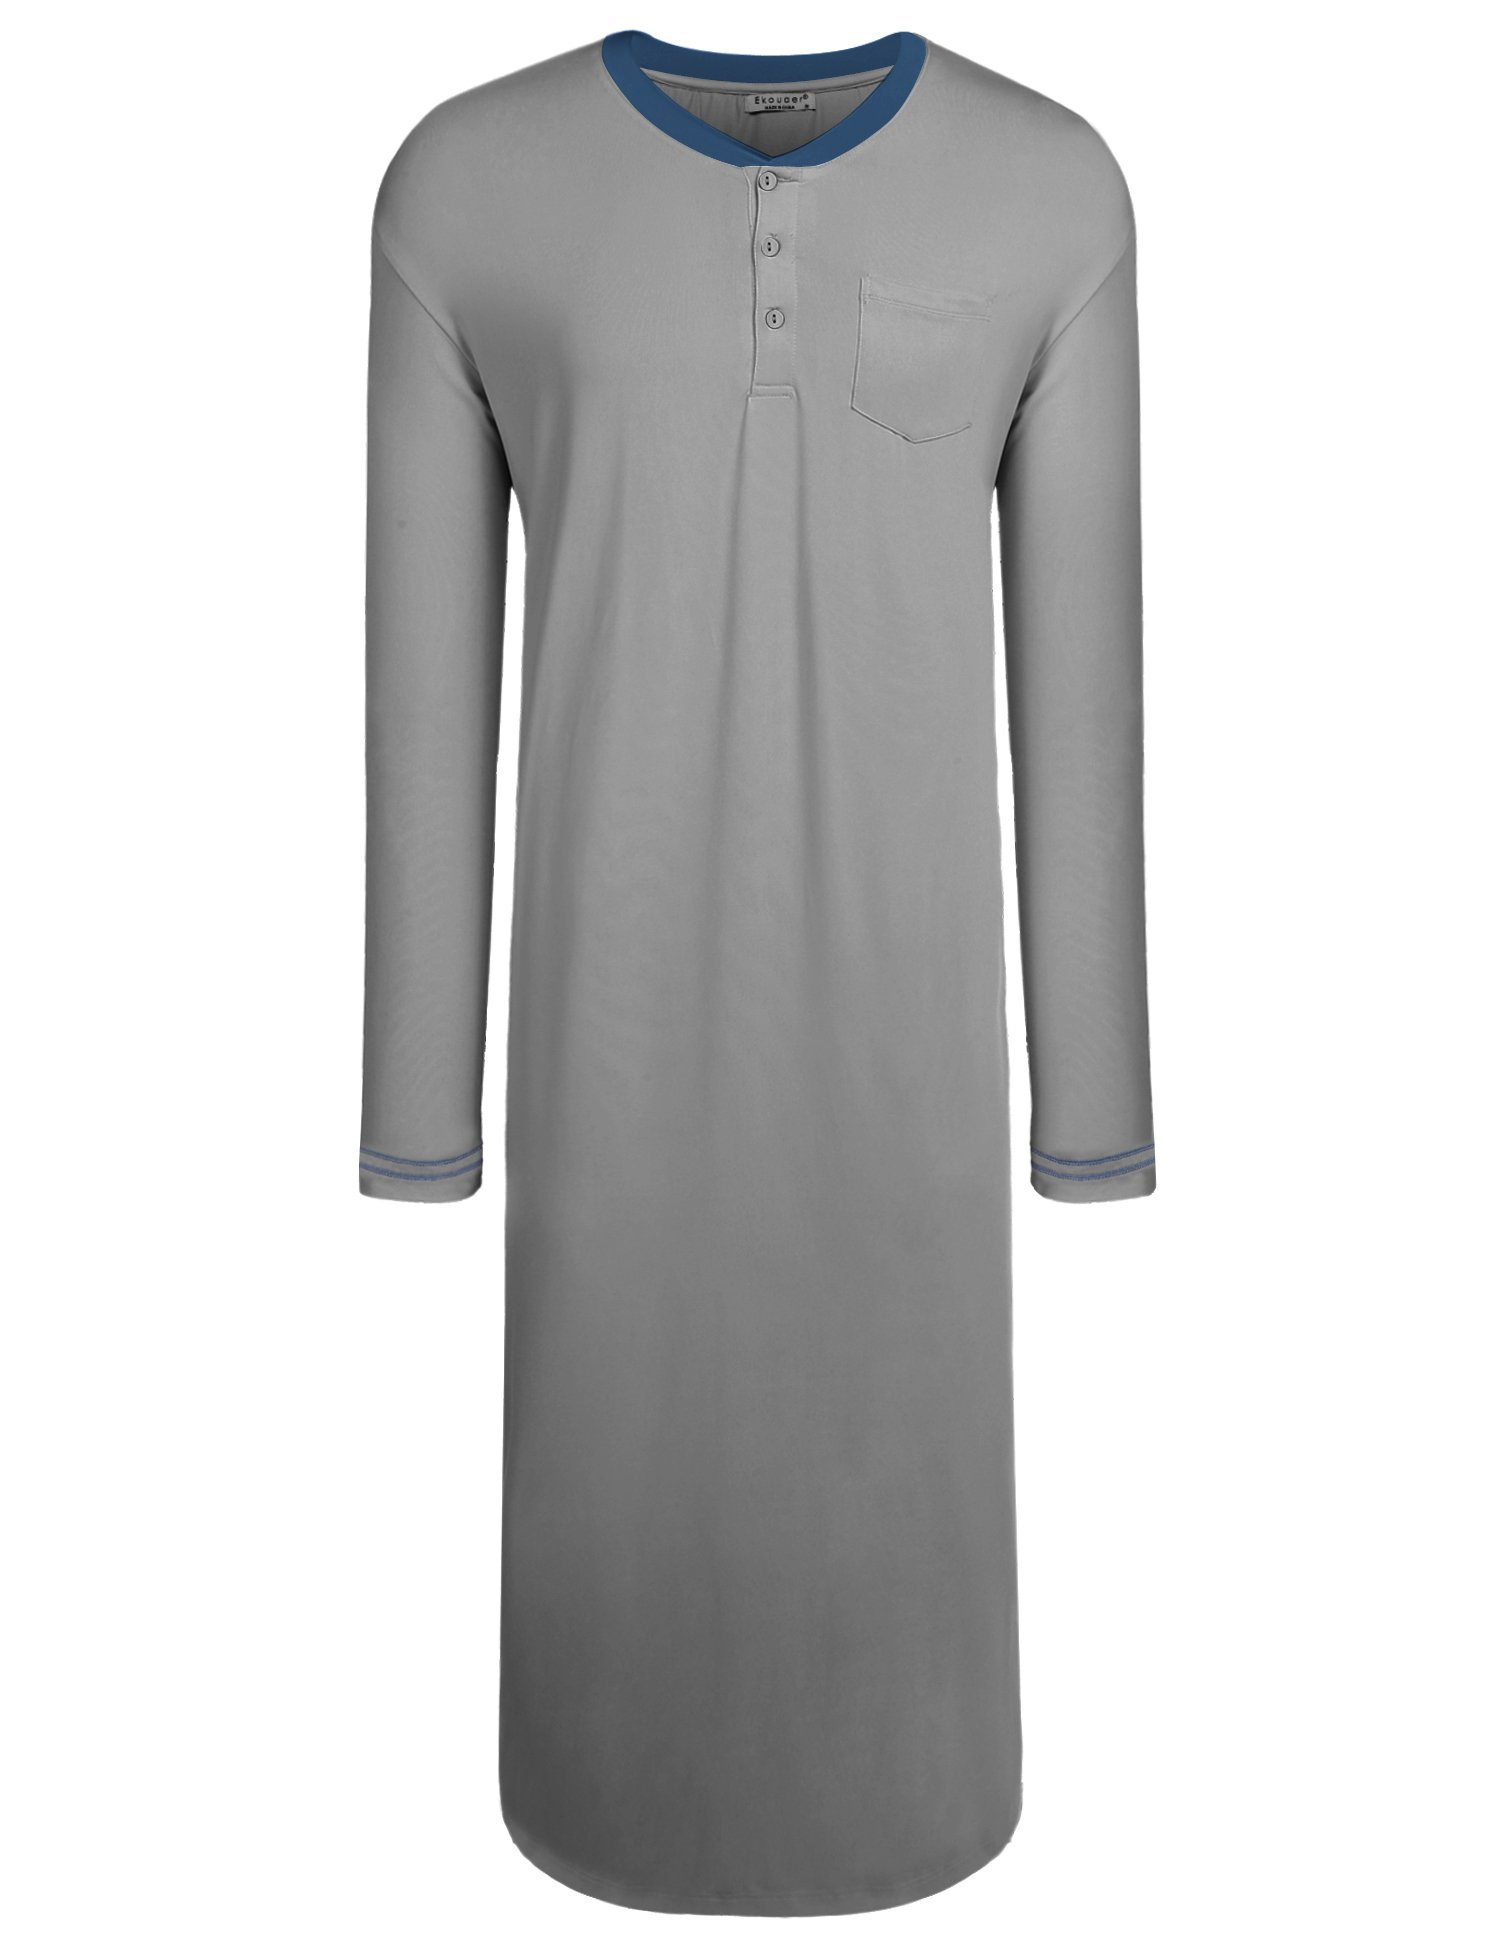 Ekouaer Men's Nightshirts Soft Sleepwear Night Shirt Henley Sleep Shirt (Grey, XX-Large)